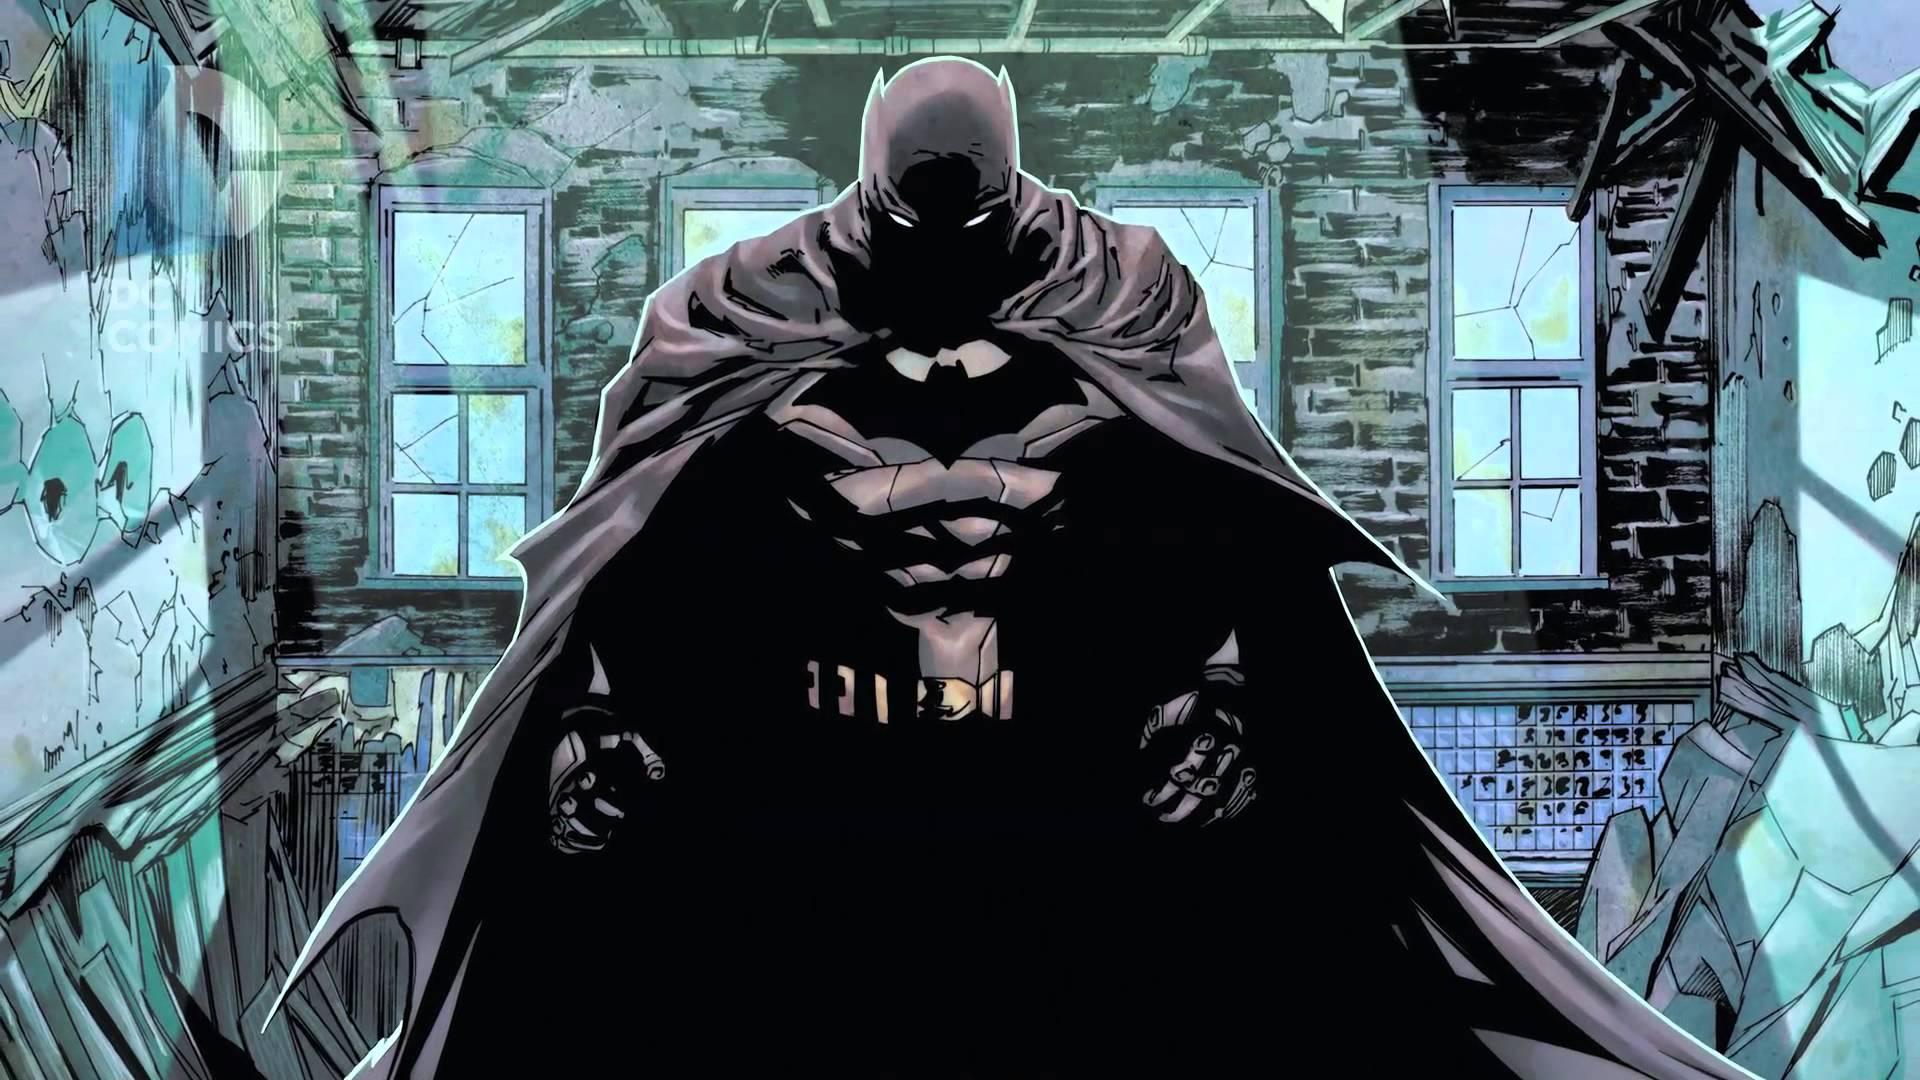 Images For Frank Miller Batman Wallpaper 1920x1080